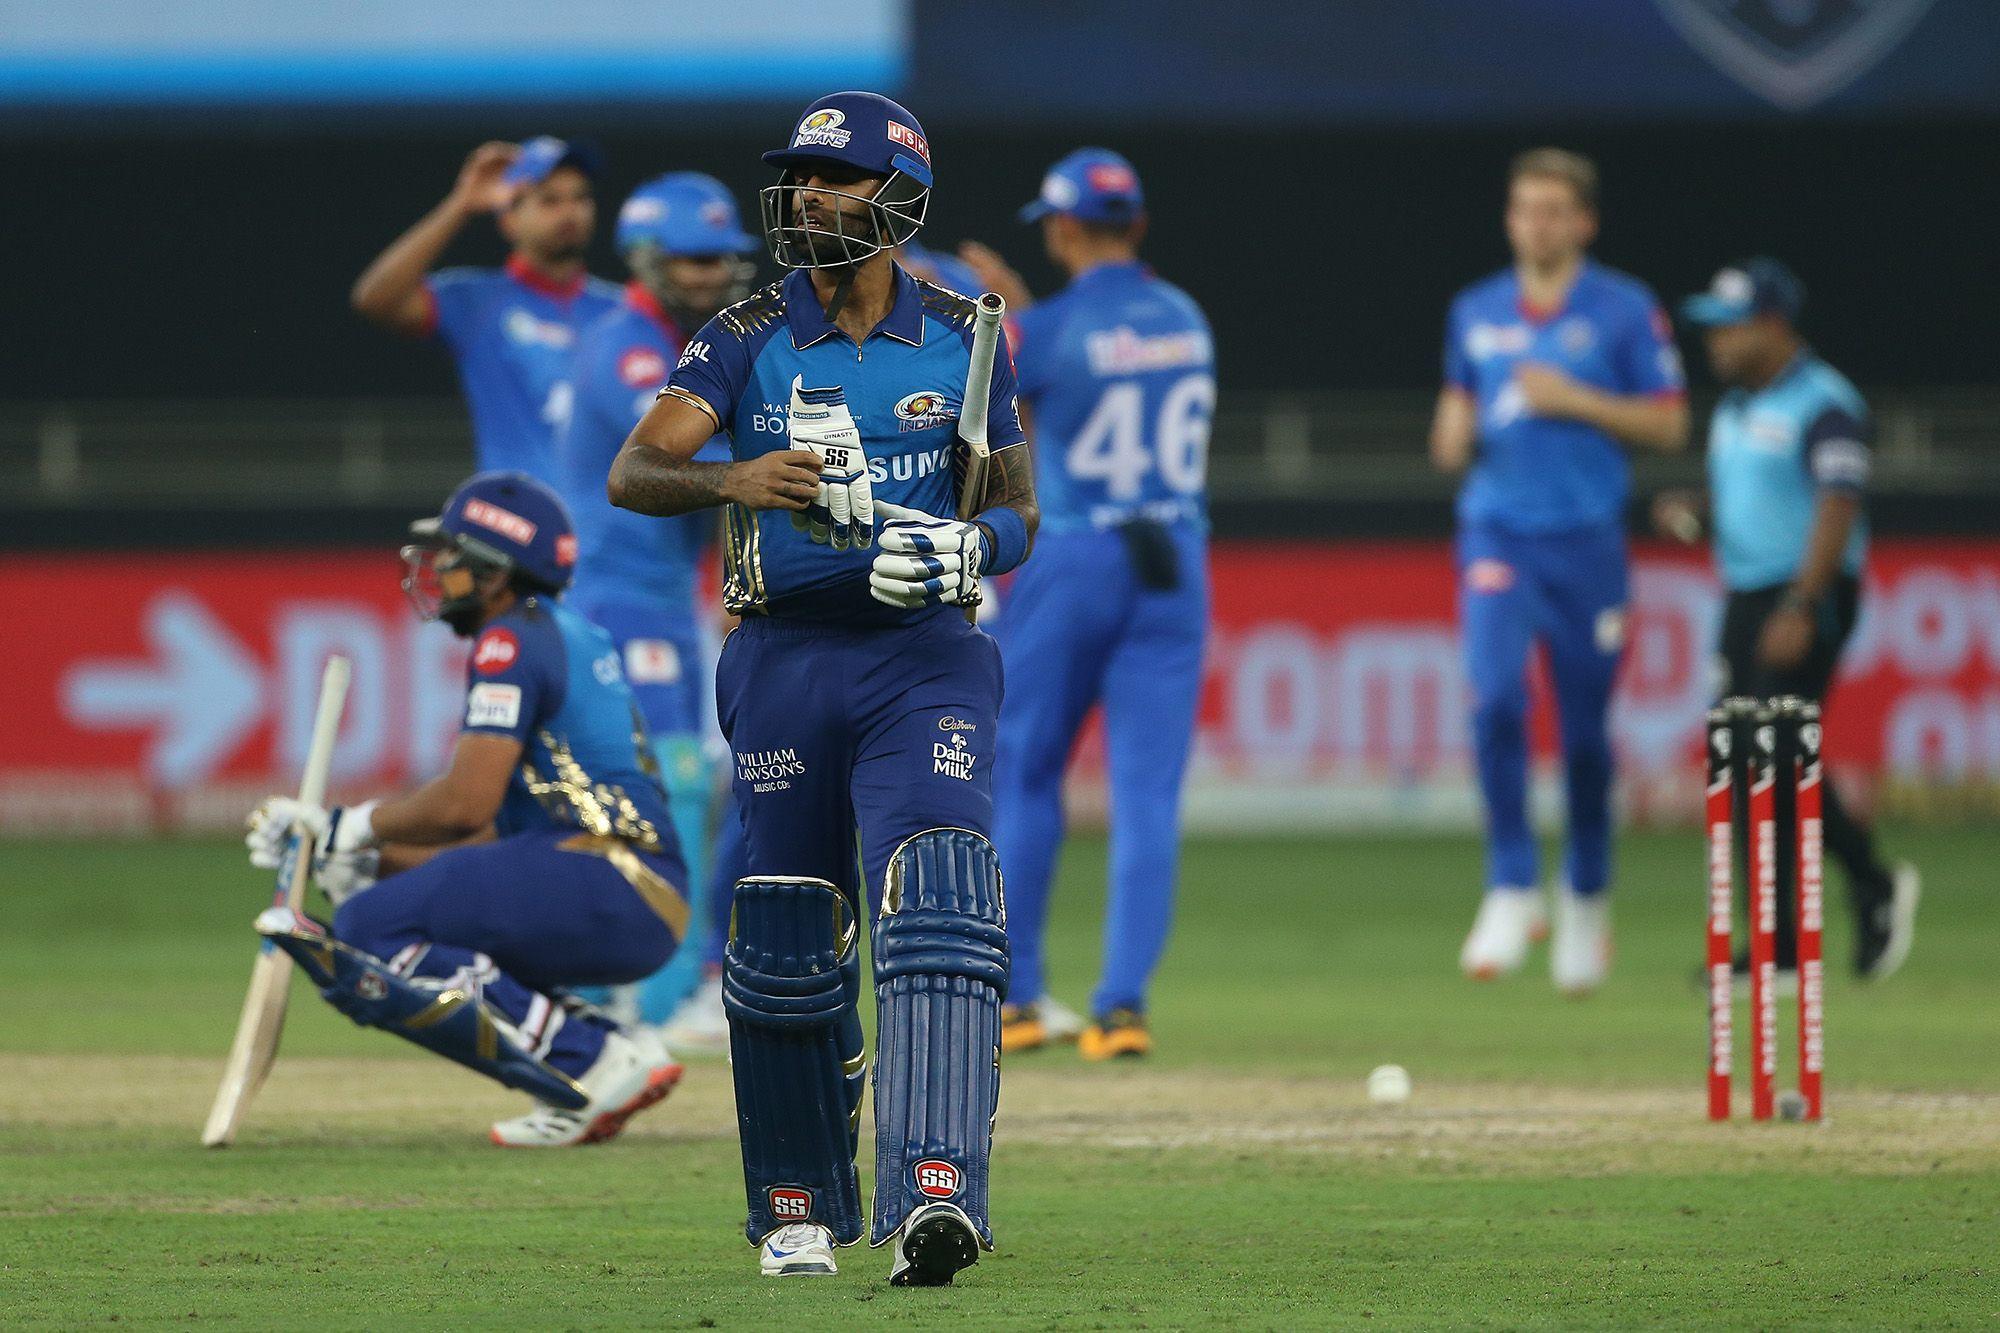 A dejected Suryakumar Yadav walks off after getting run-out   BCCI/IPL